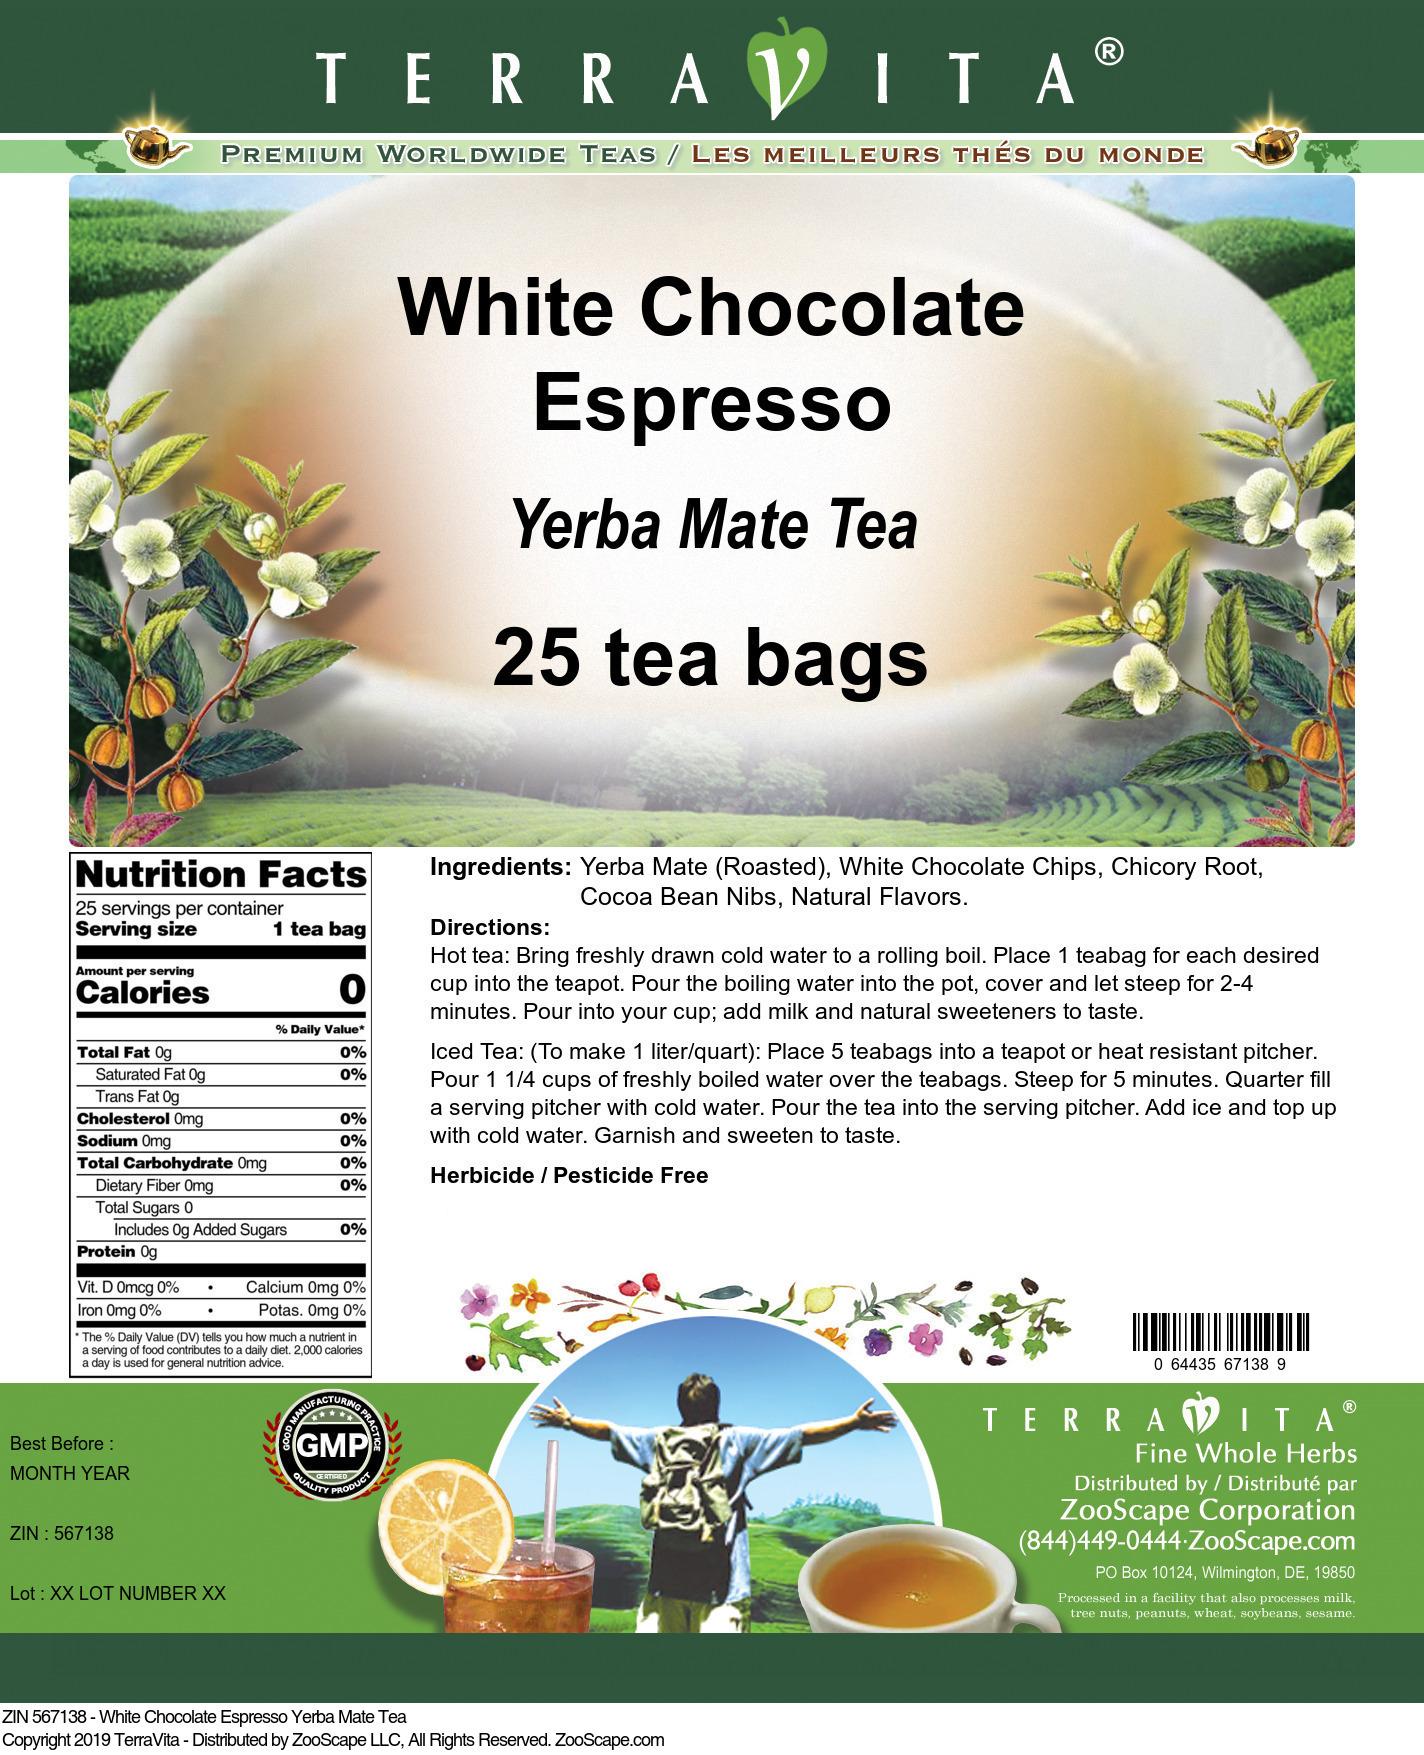 White Chocolate Espresso Yerba Mate Tea